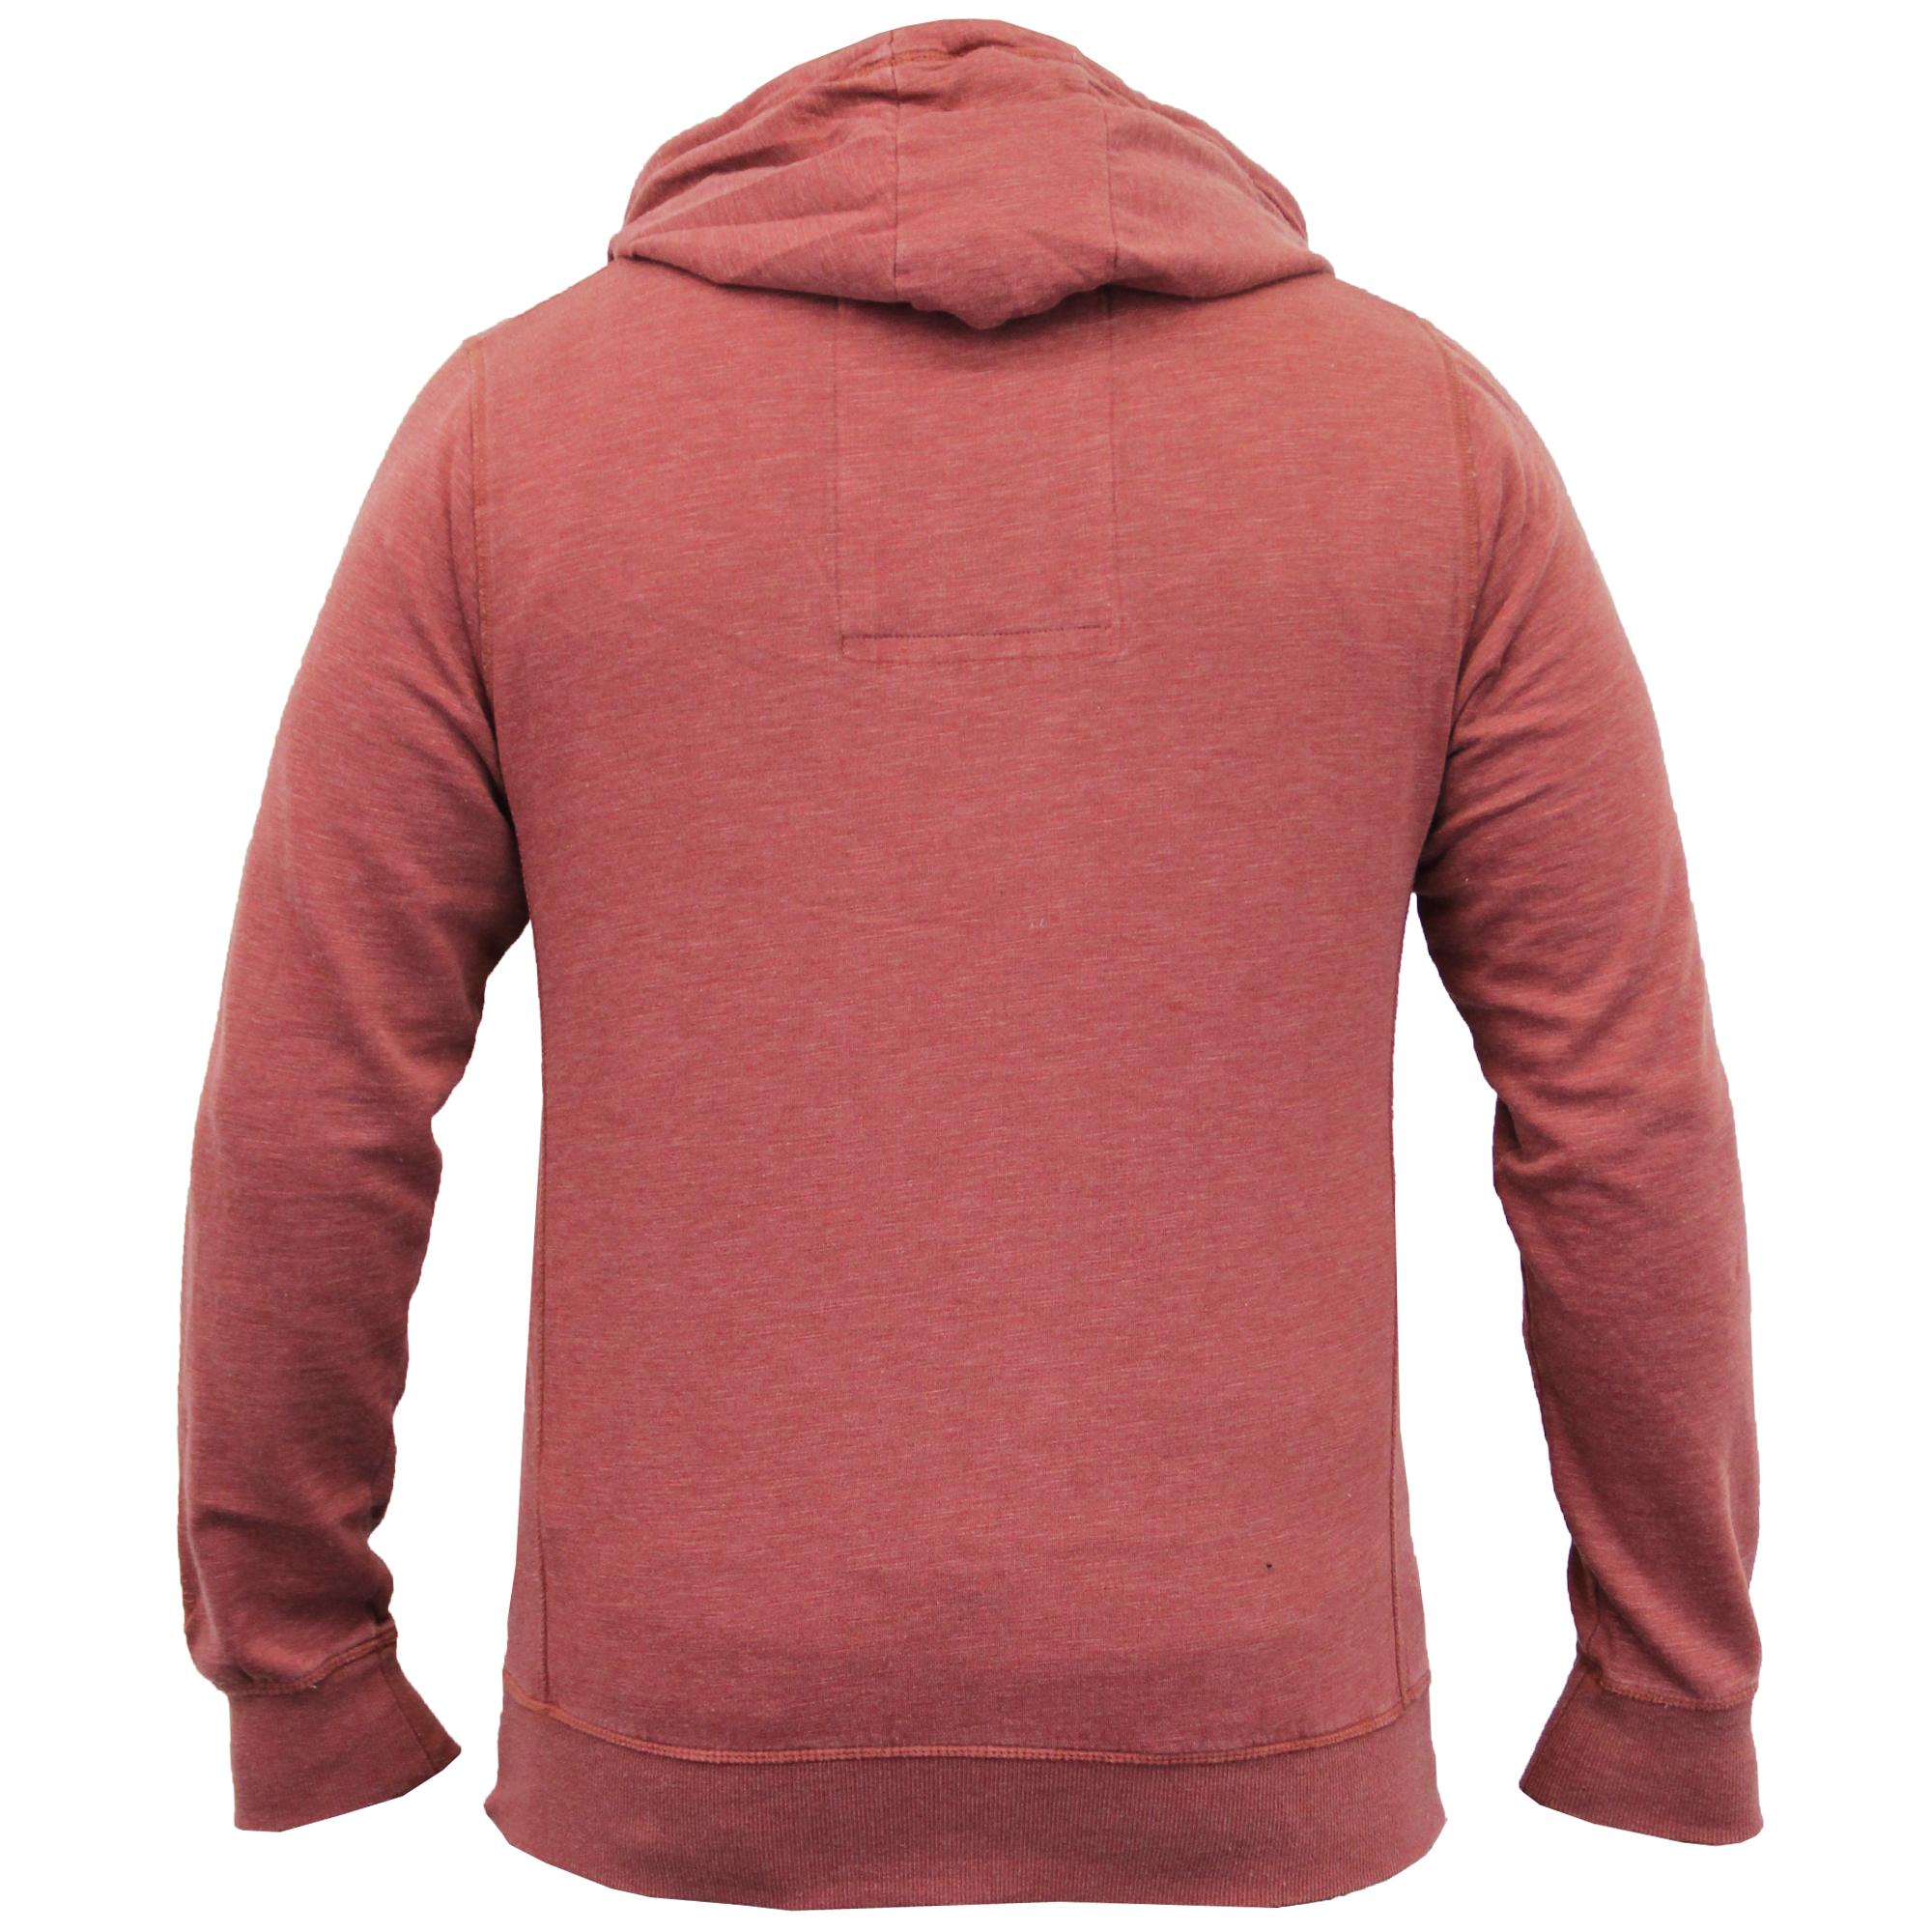 Mens-Sweatshirt-Tokyo-Laundry-Hooded-Top-Sweat-Applique-Zip-Gym-Fleece-Lined-New thumbnail 23